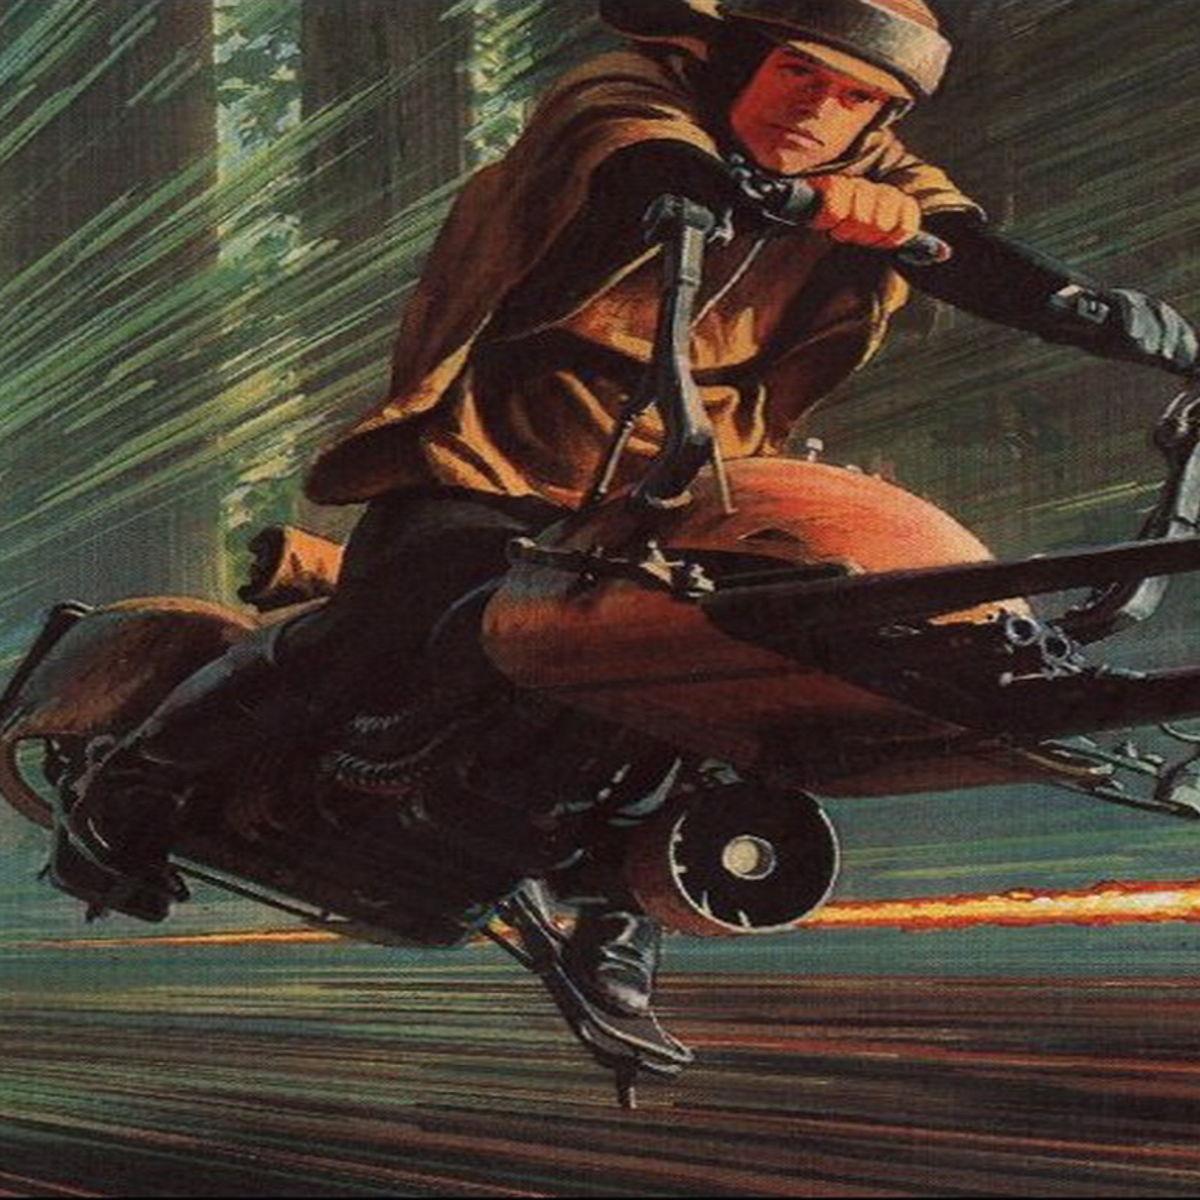 Return-Of-The-Jedi-Pursuit-in-Endor-star-wars-25252281-1024-768.jpg